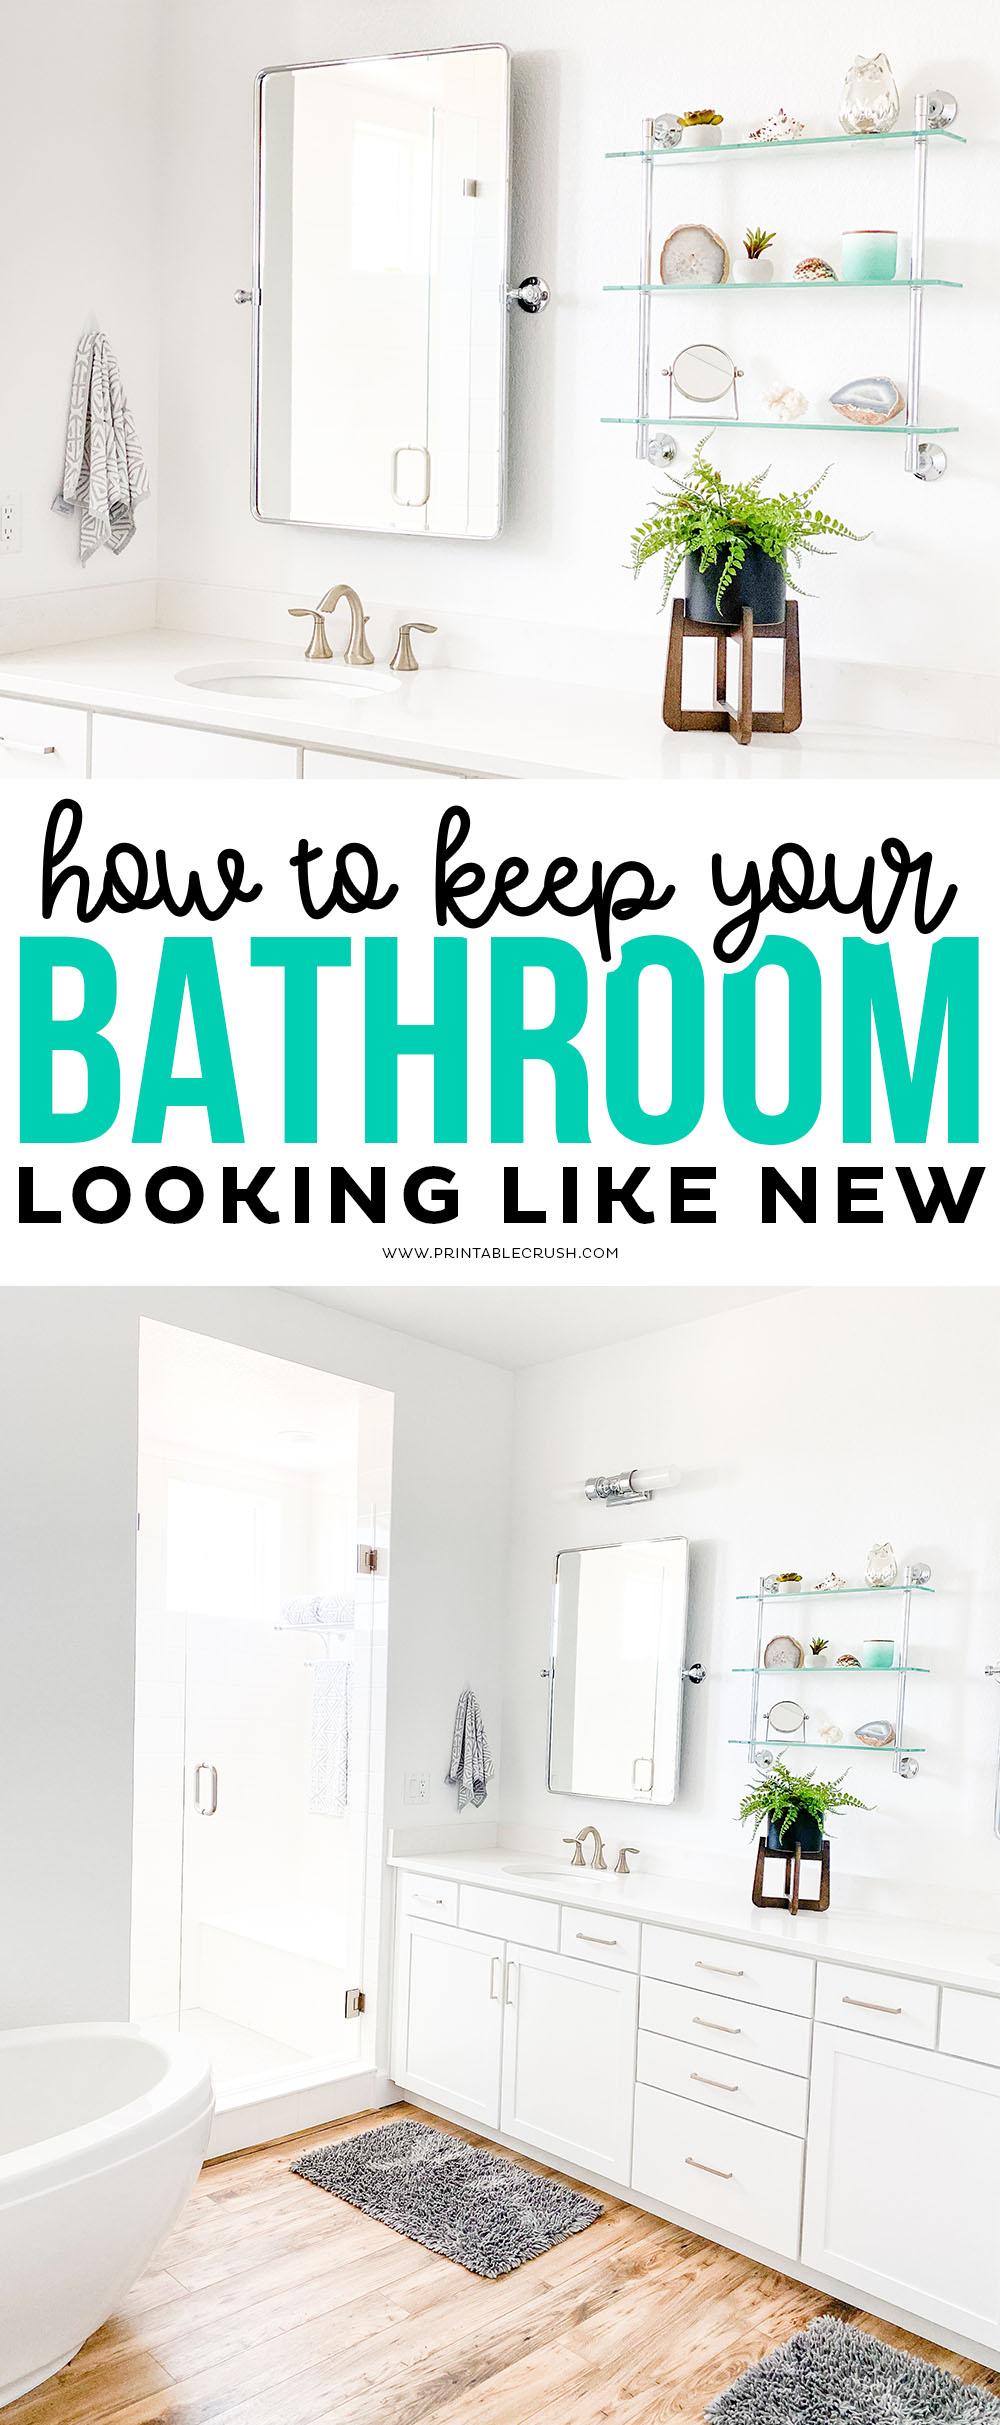 How to Keep a Clean Bathroom - Printable Crush #cleanbathroom #cleaningtips #homedecor #bathroomdecor #cleanbathroom via @printablecrush